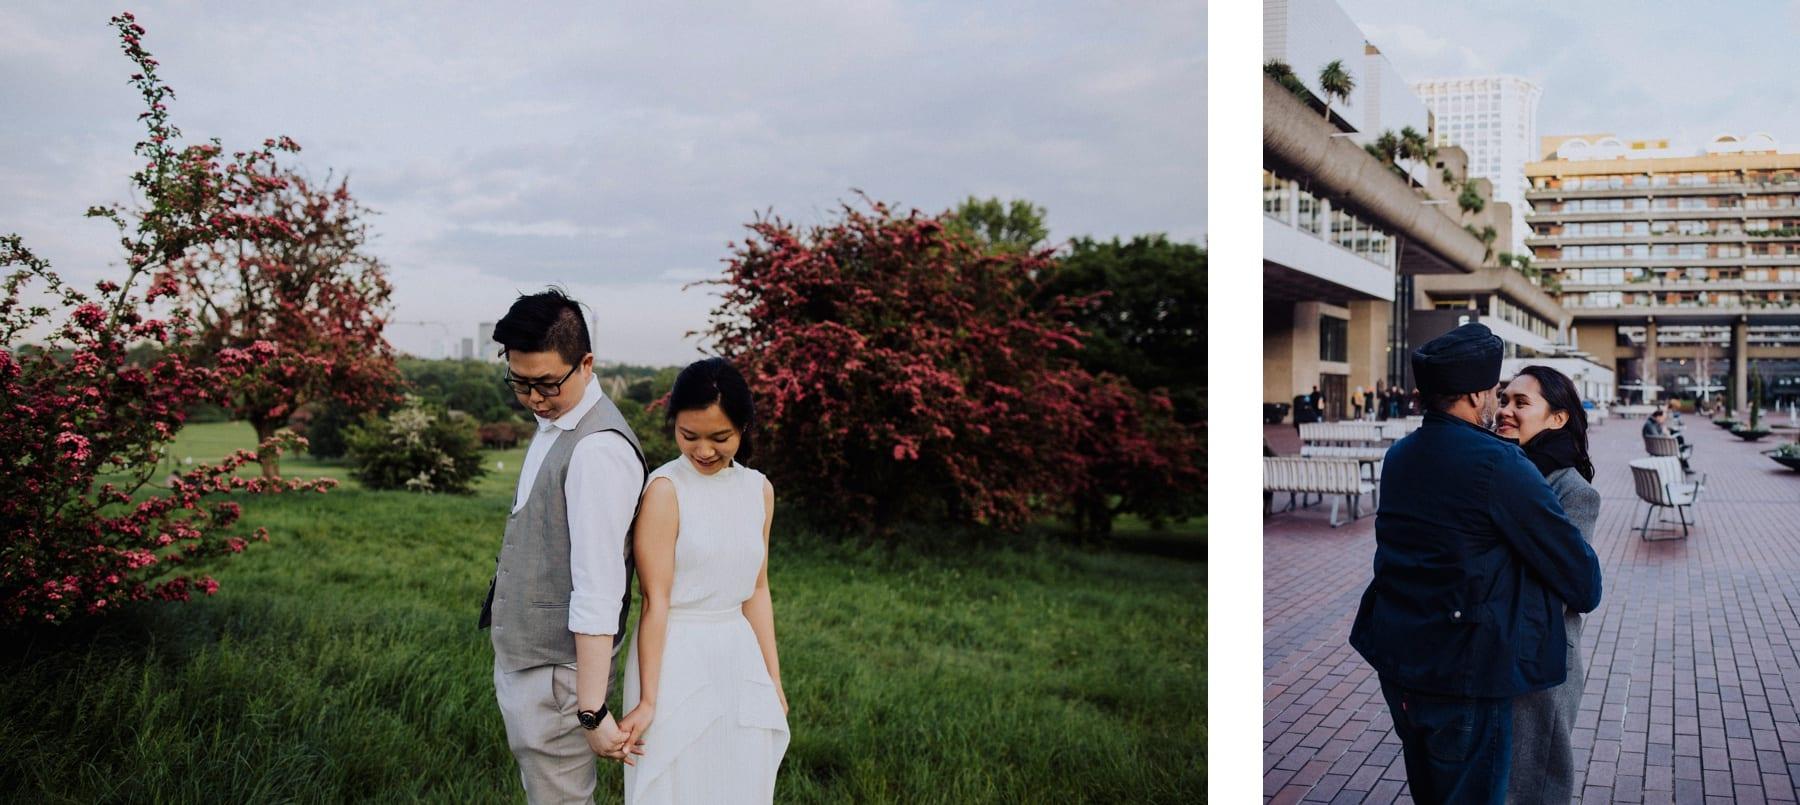 Wedding photos in London